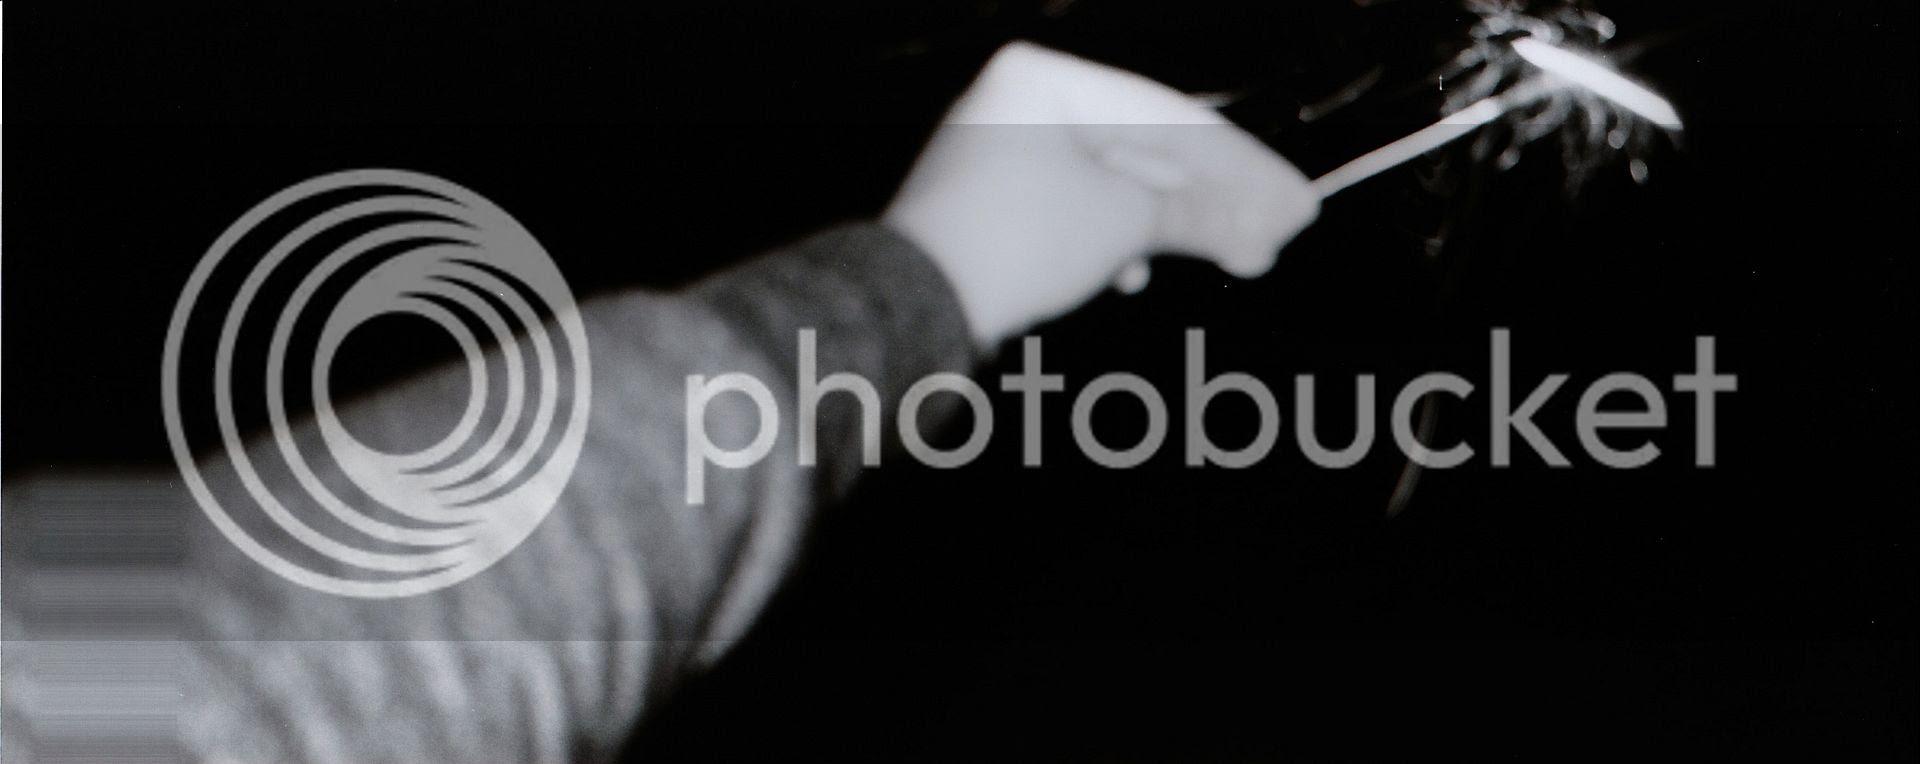 photo sparkler4_zpsa8a5854b.jpg